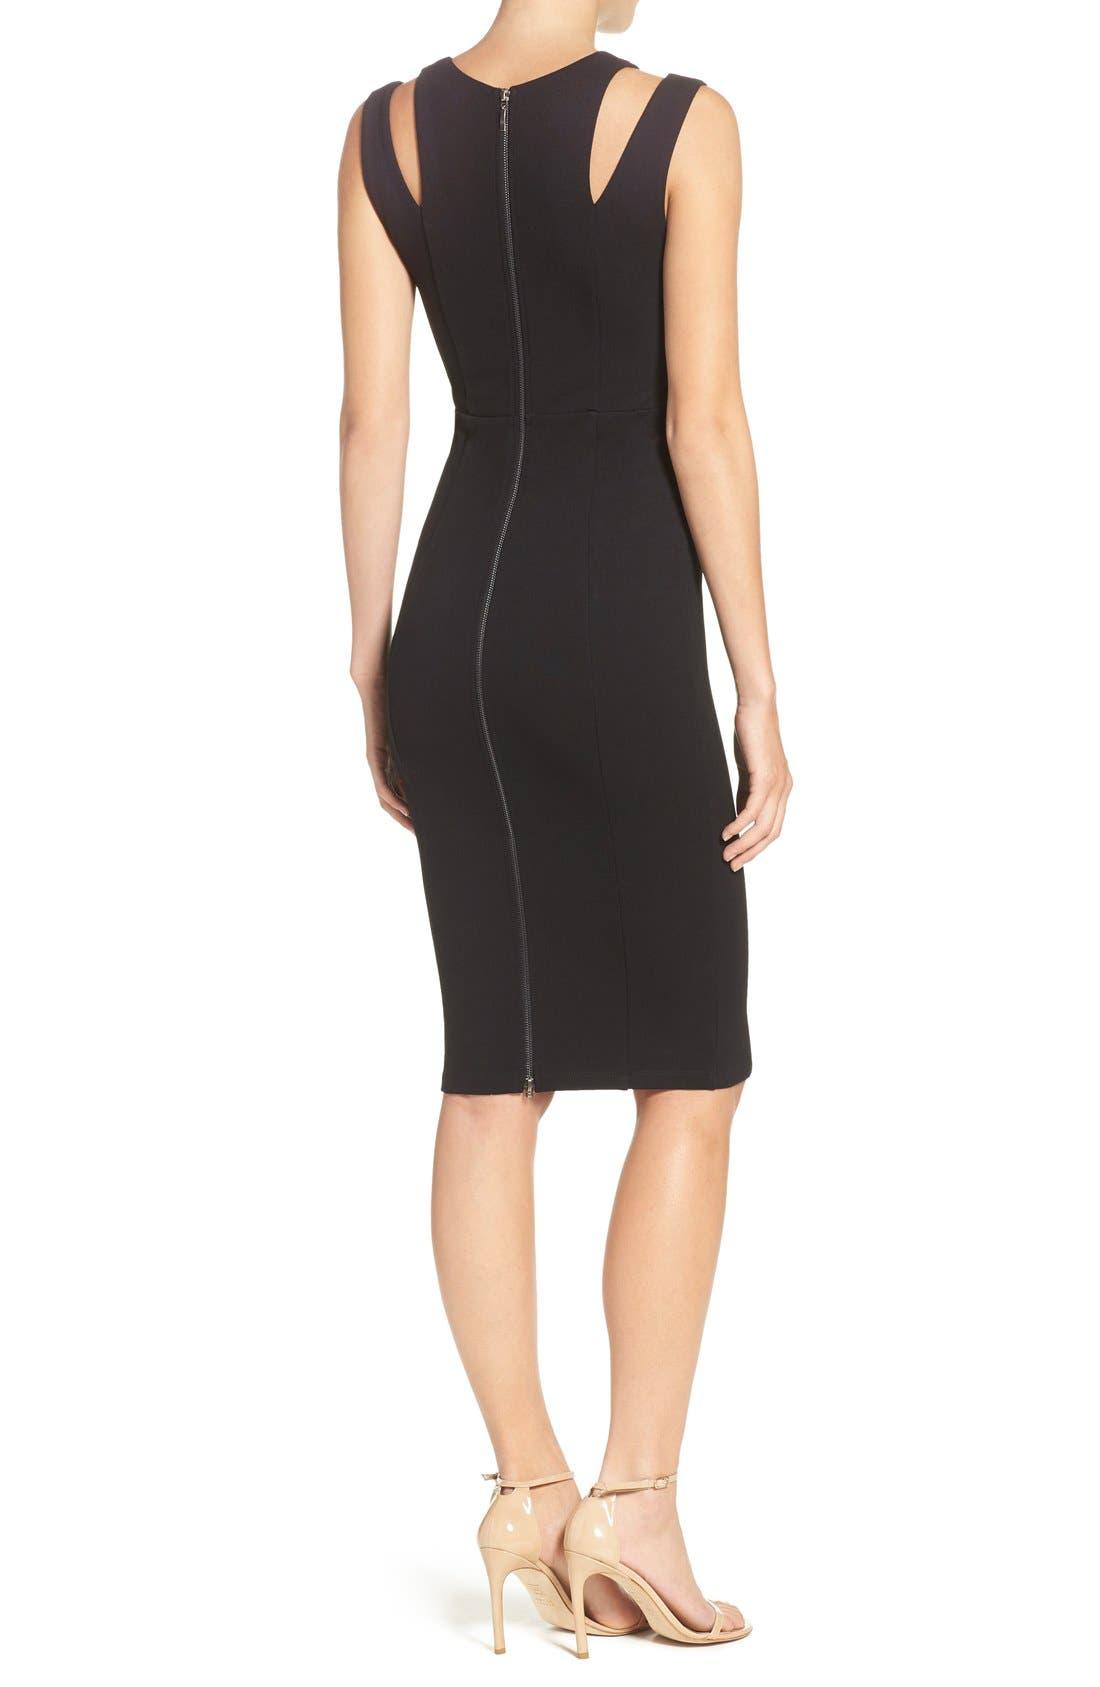 Alternate Image 2  - Felicity & Coco Shoulder Detail Ponte Sheath Dress (Regular & Petite) (Nordstrom Exclusive)